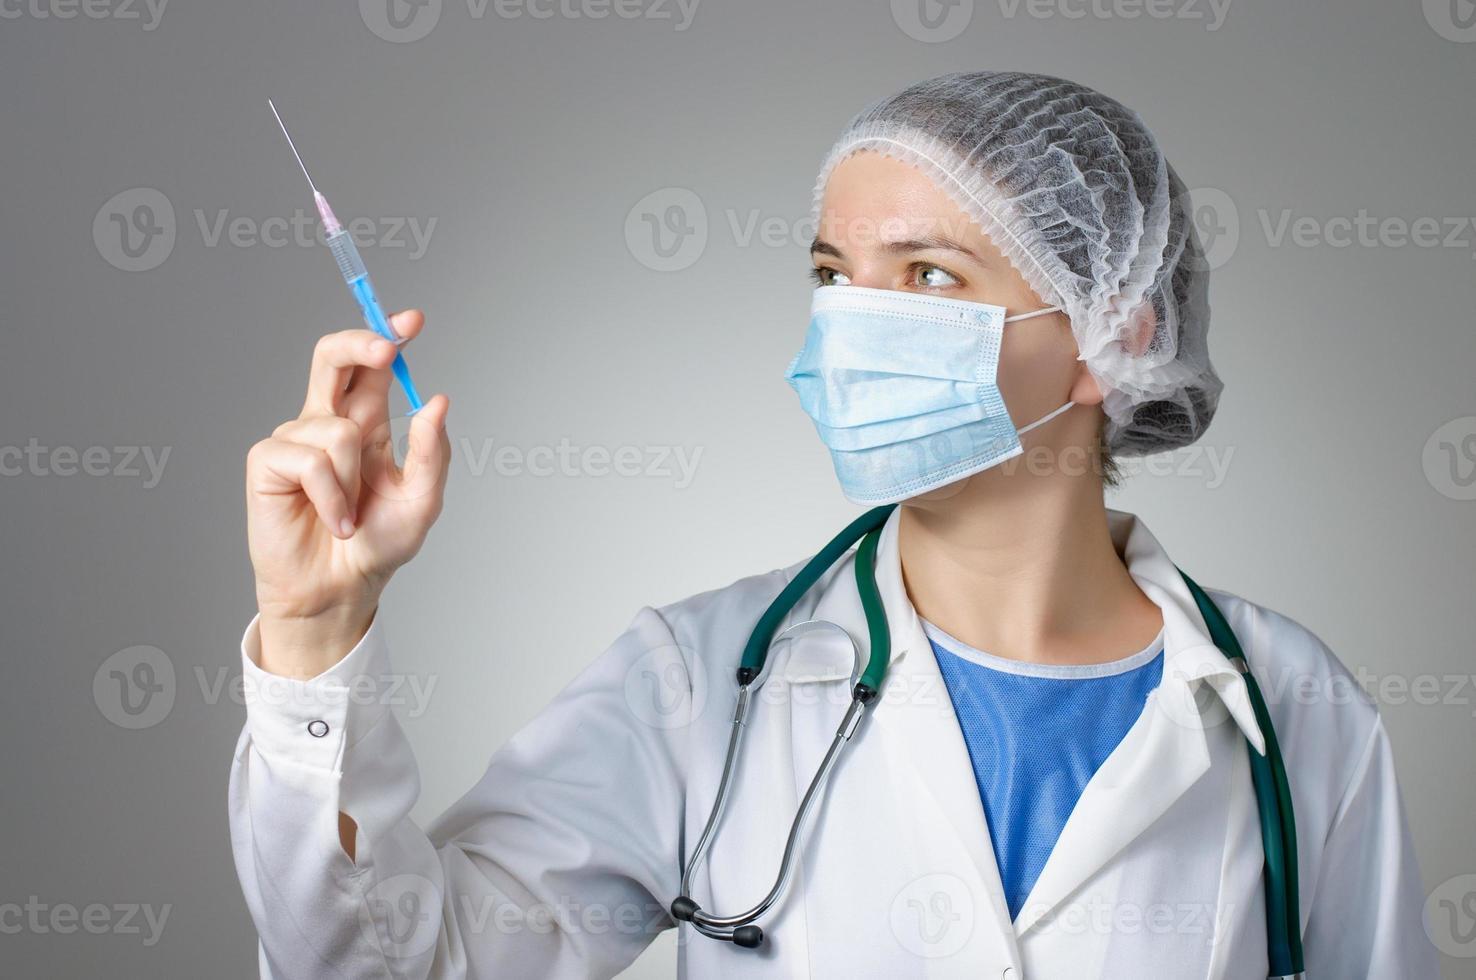 dottoressa con siringa foto